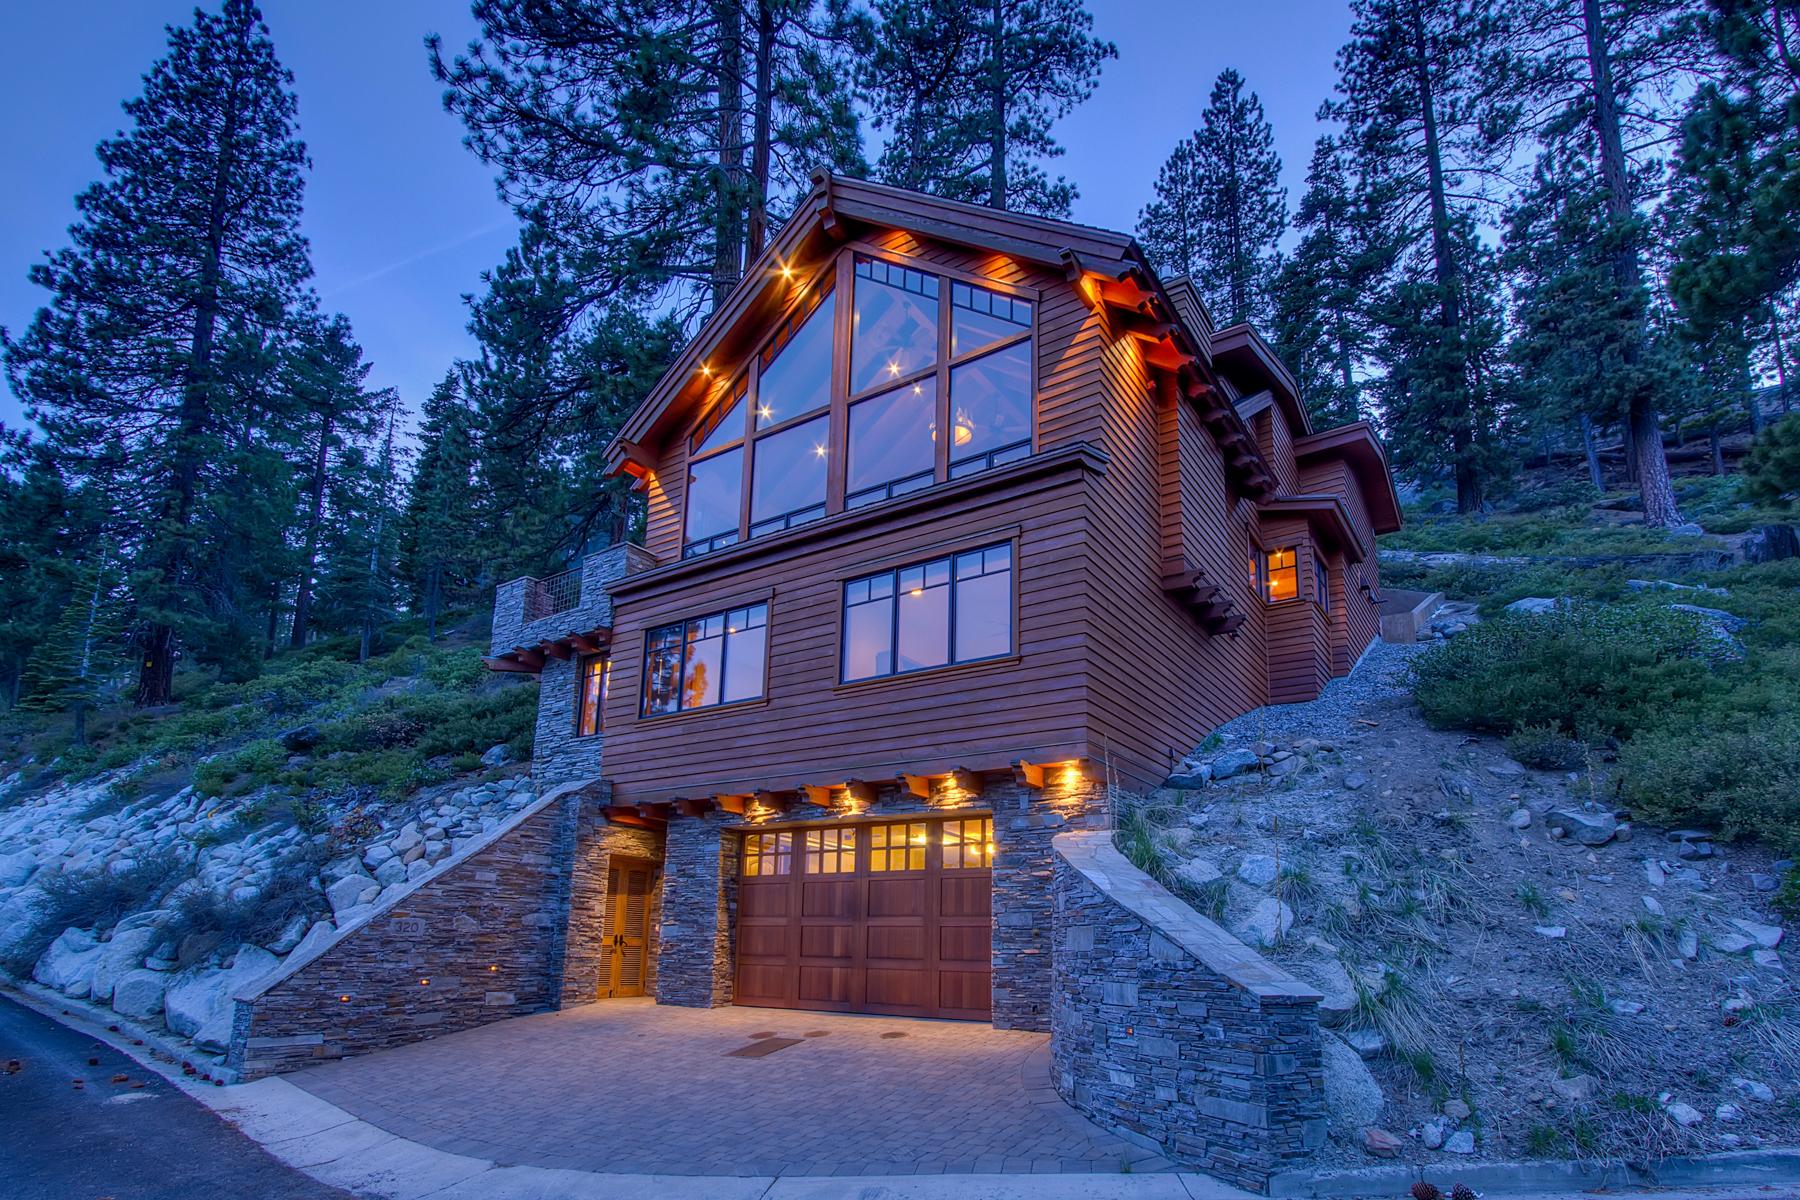 Single Family Home for Sale at 320 Anaho Road, Crystal Bay, Nevada Crystal Bay, Nevada, 89402 Lake Tahoe, United States